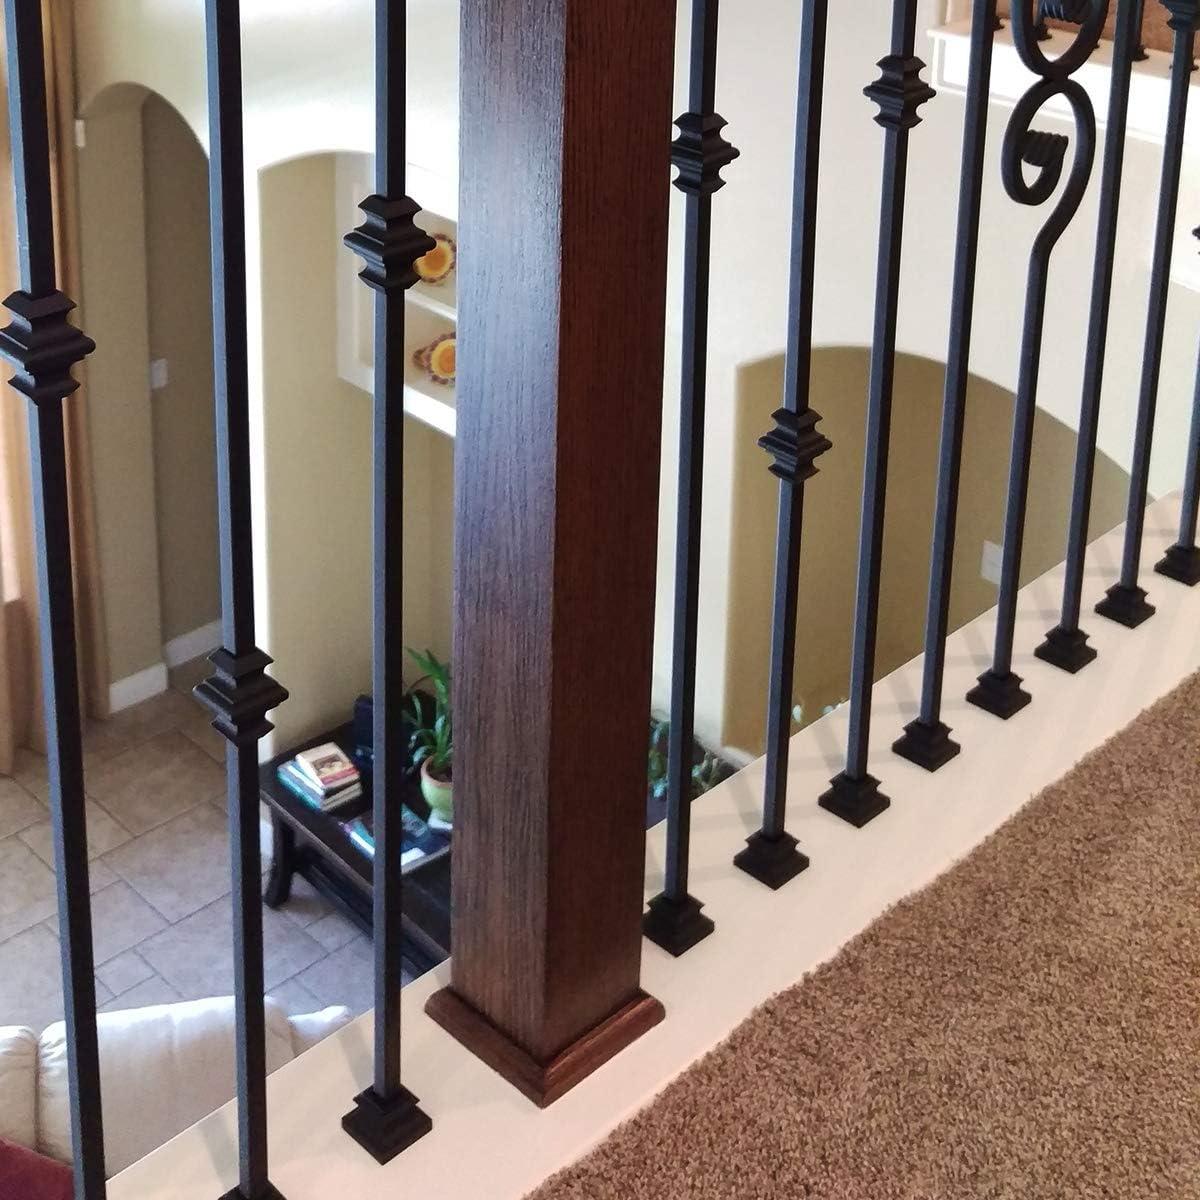 15x One Twist Vidagoods 5// 10// 15 x Matte BLACK Iron Balusters Iron Spindles METAL Stair Parts